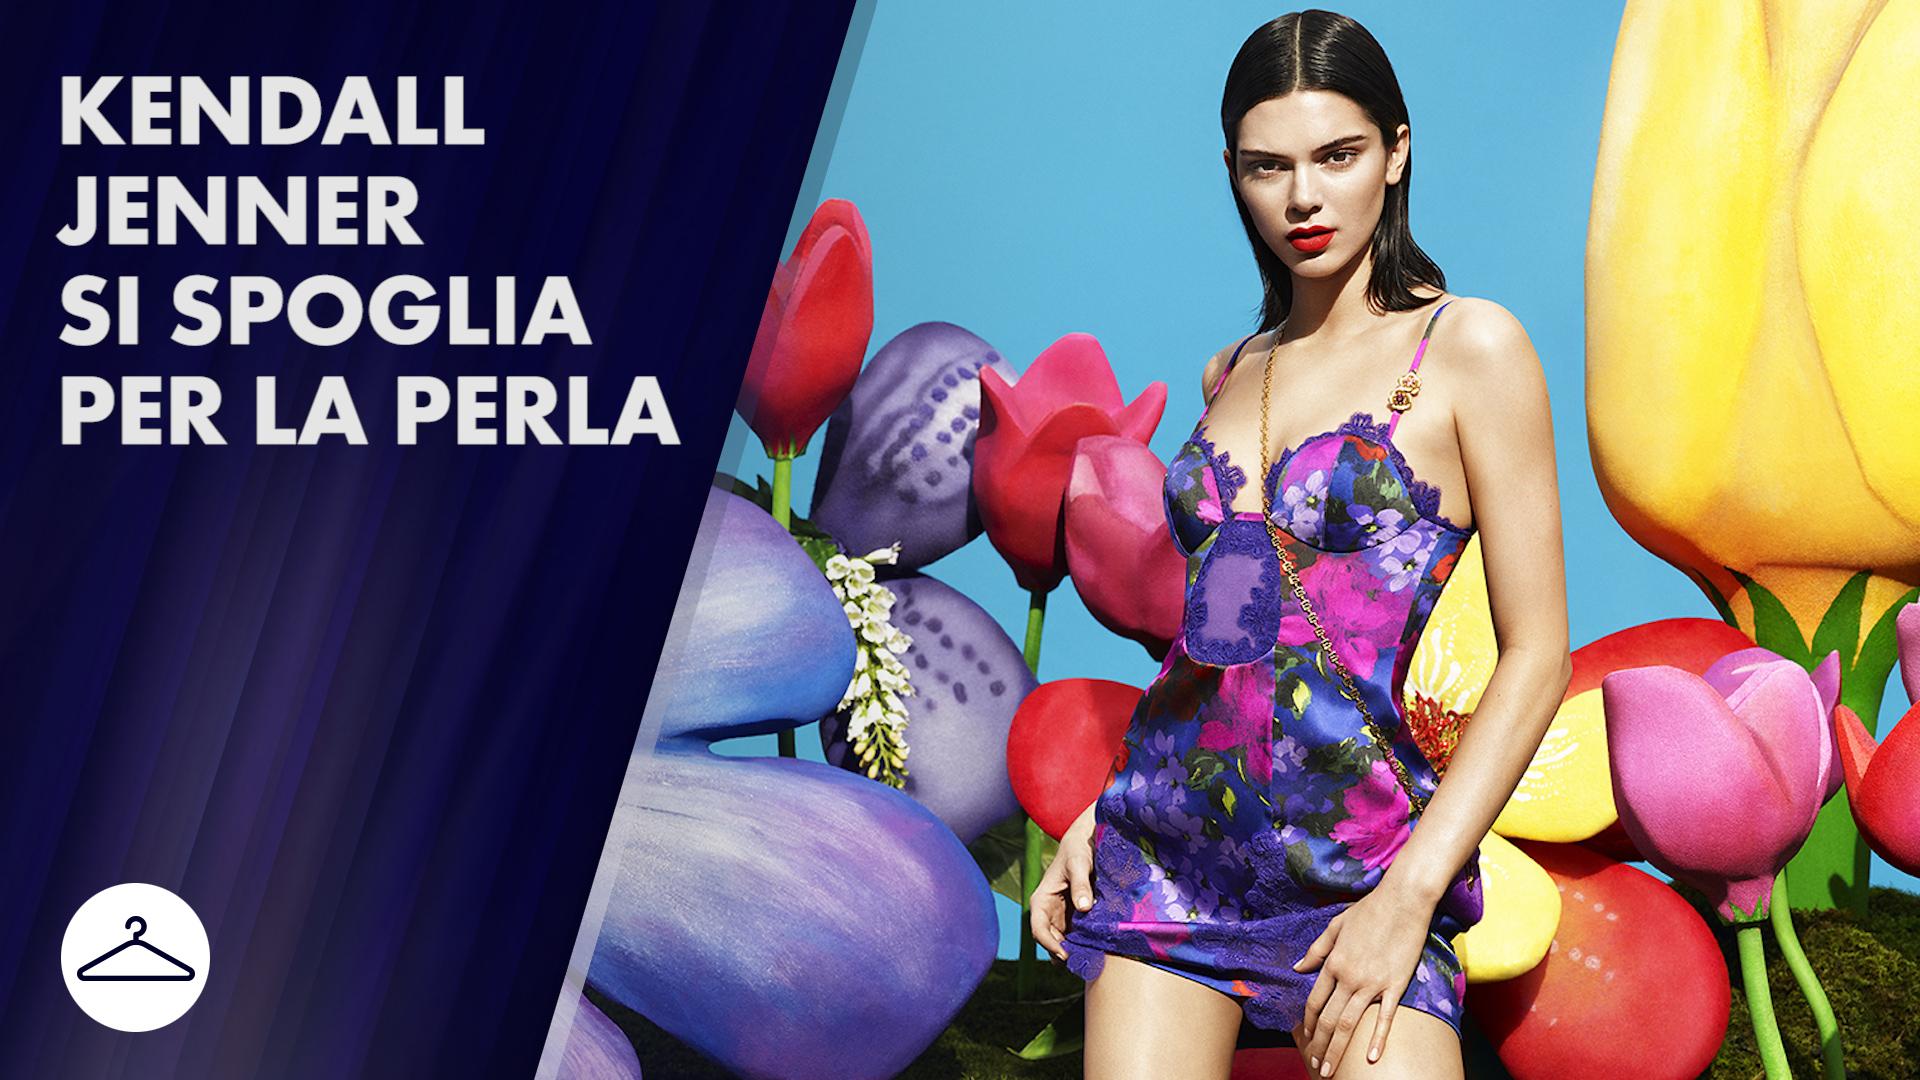 Kendall Jenner super sexy per La Perla